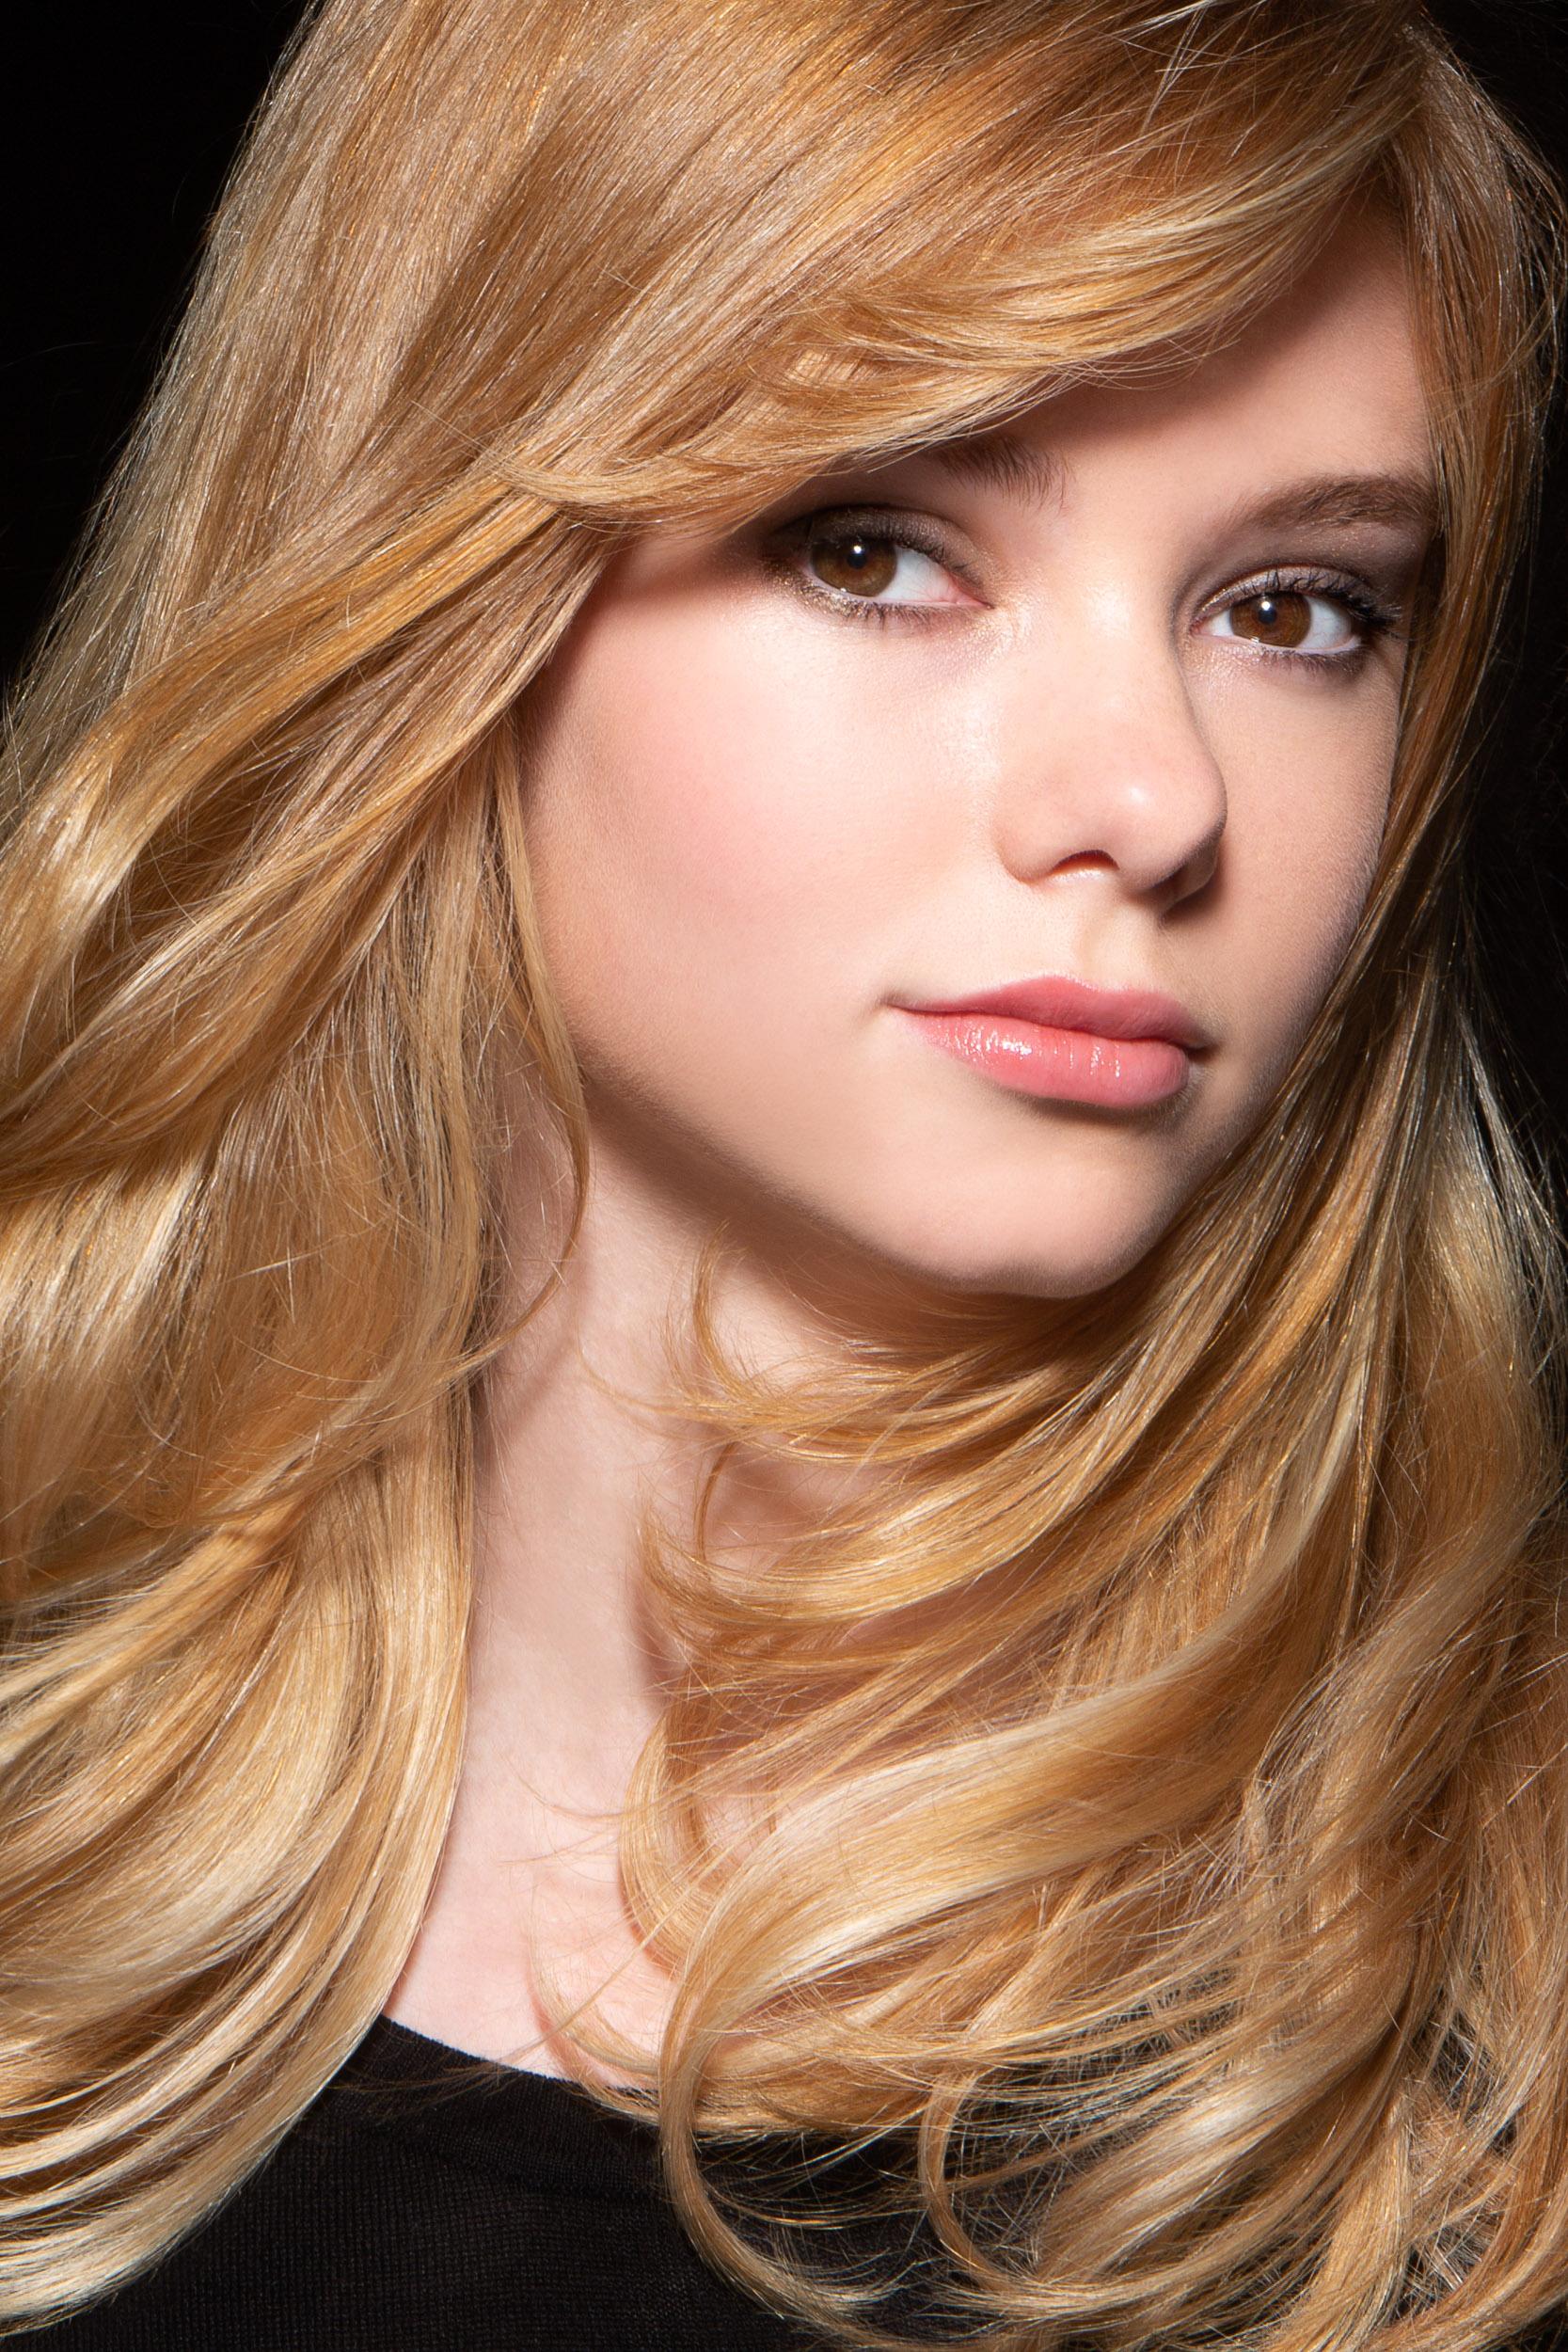 Hair - Cut, Colour & Style